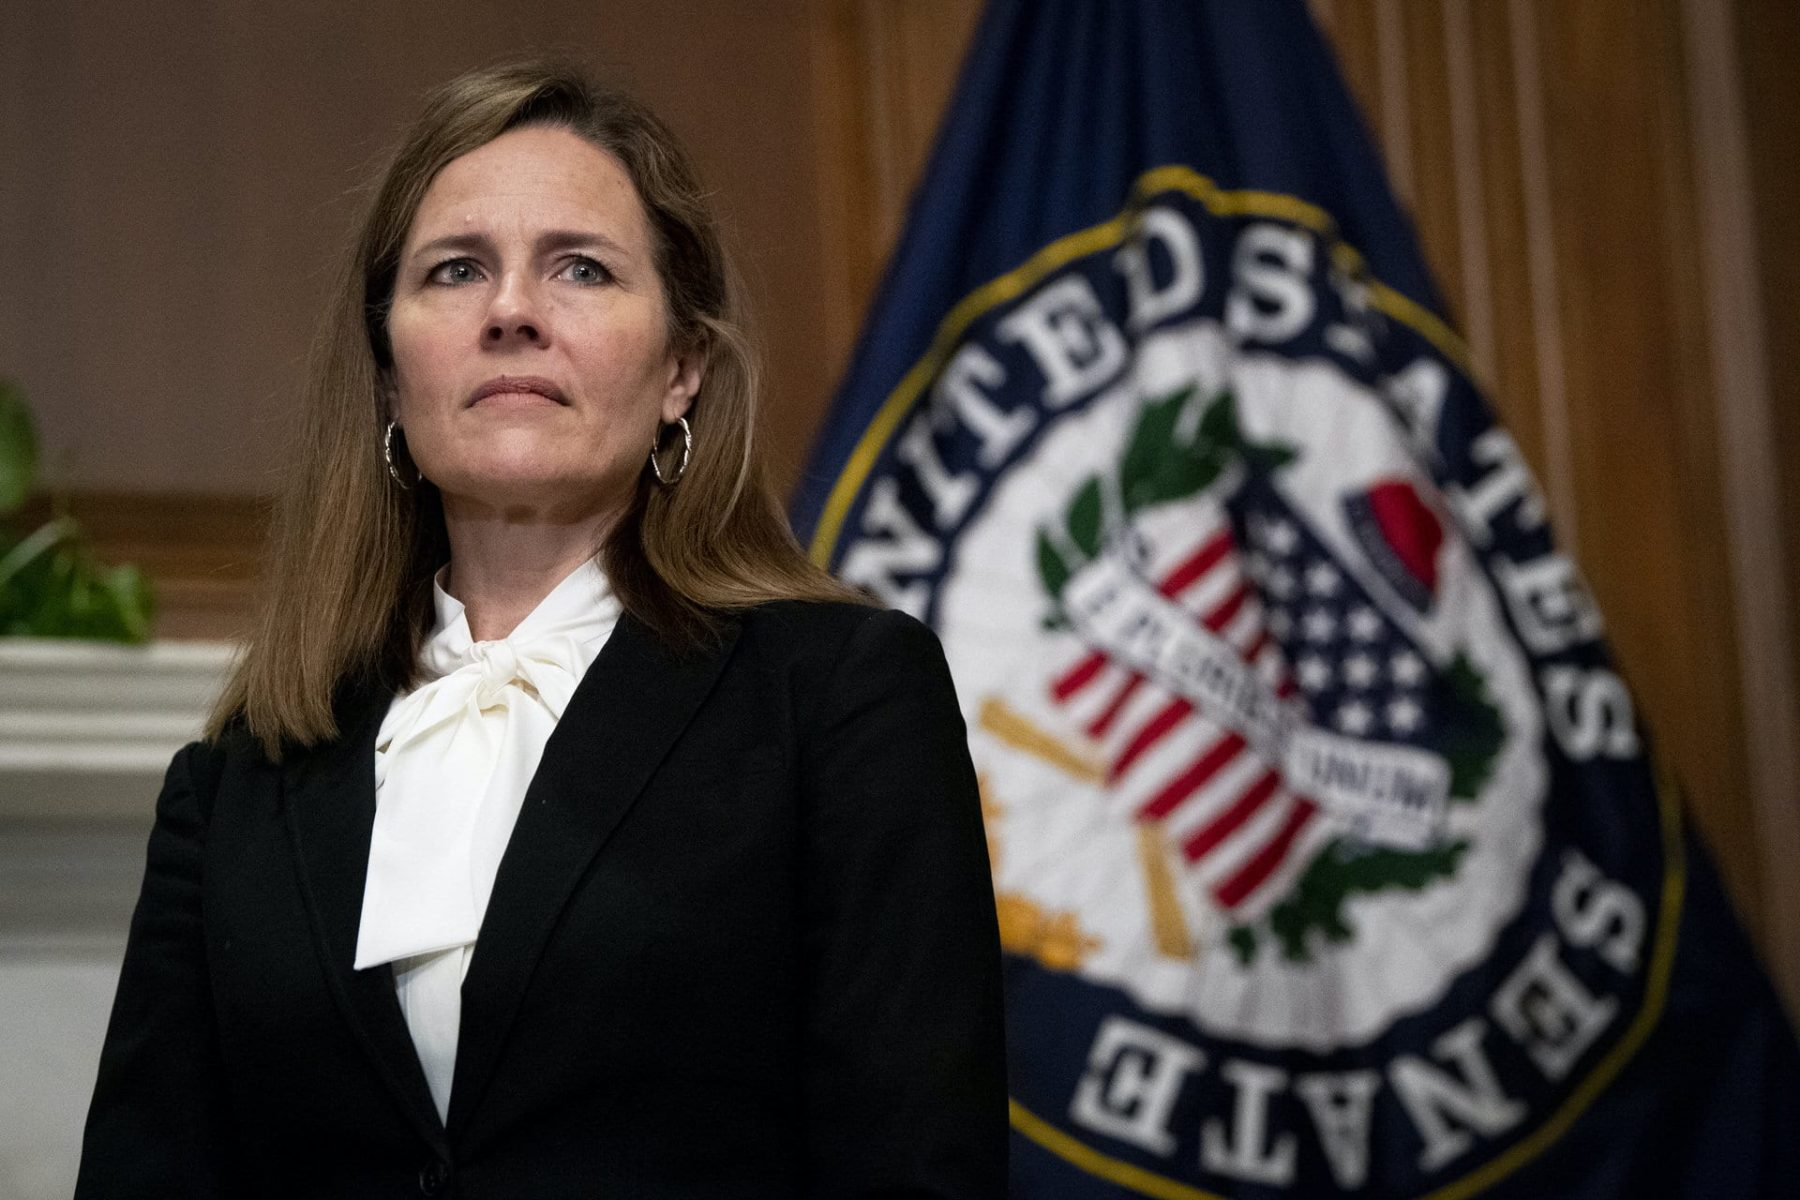 Supreme Court nominee Judge Amy Coney Barrett at the Capitol in Washington